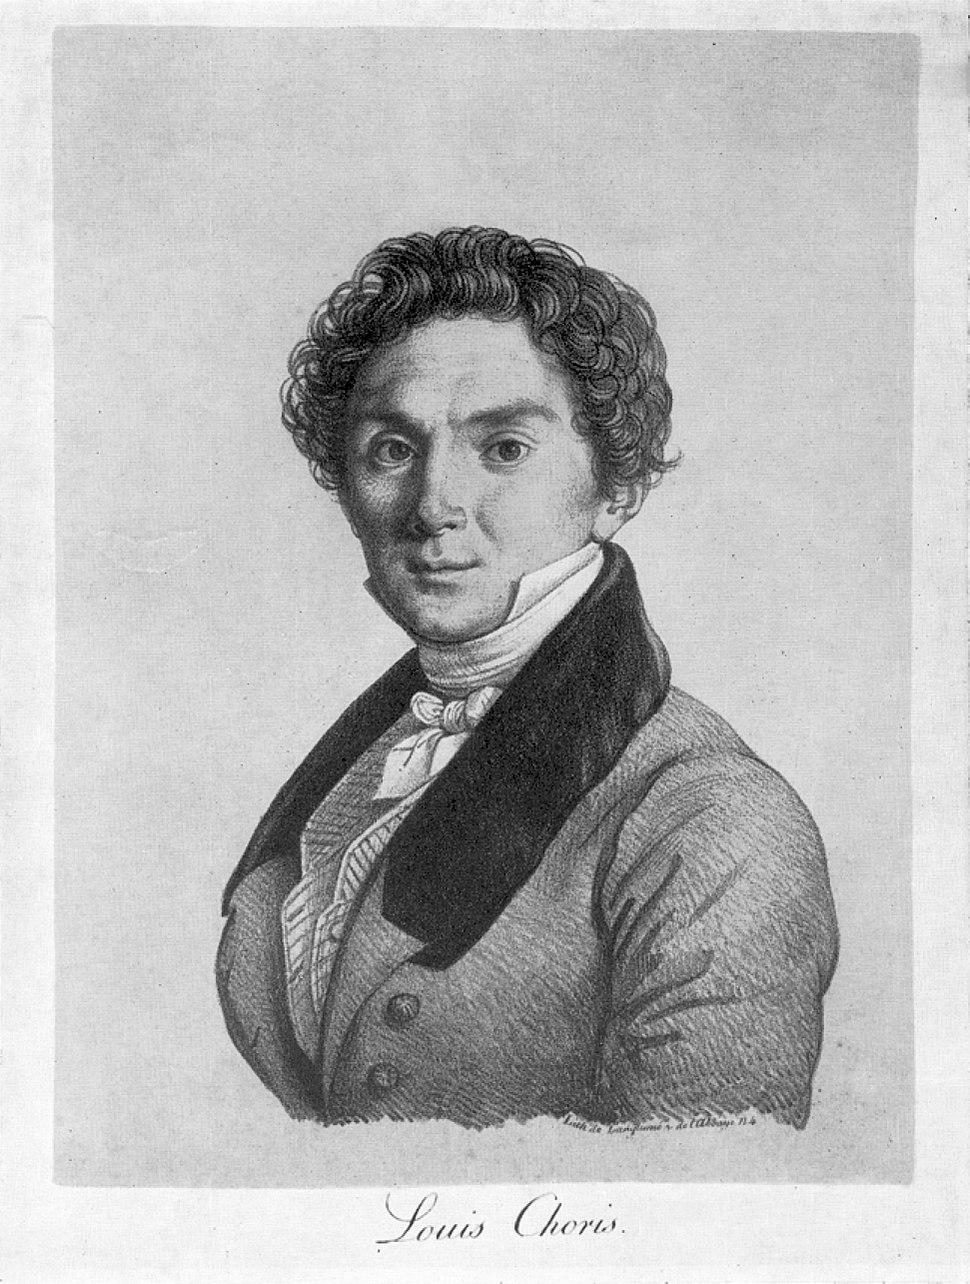 Louis Choris